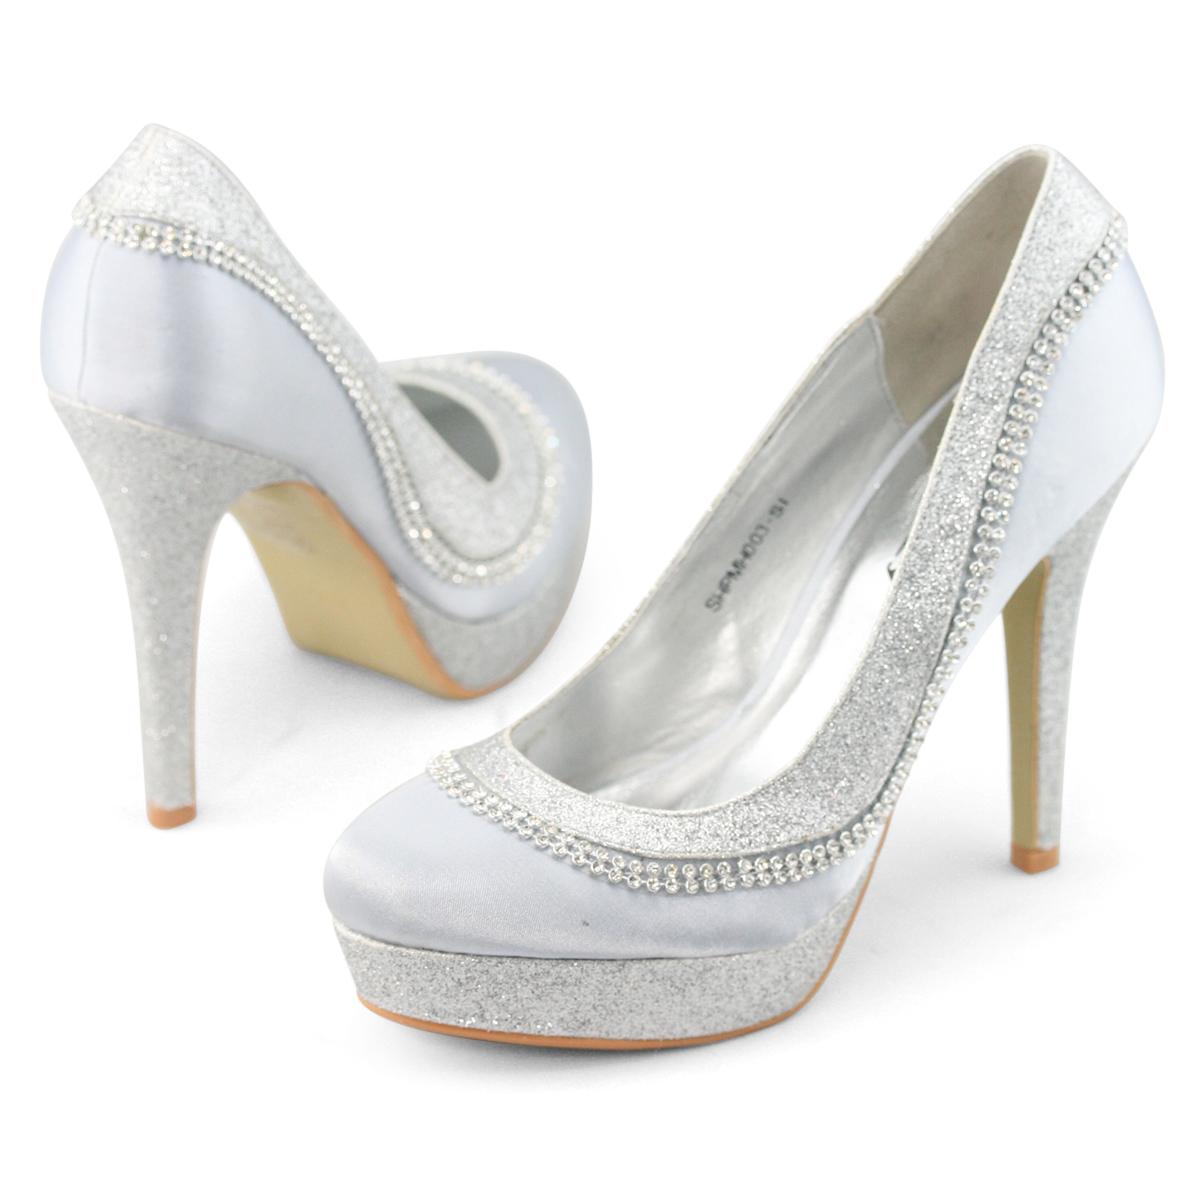 SHOEZY New Womens Silver Rhinestone Wedding Party Dress ...